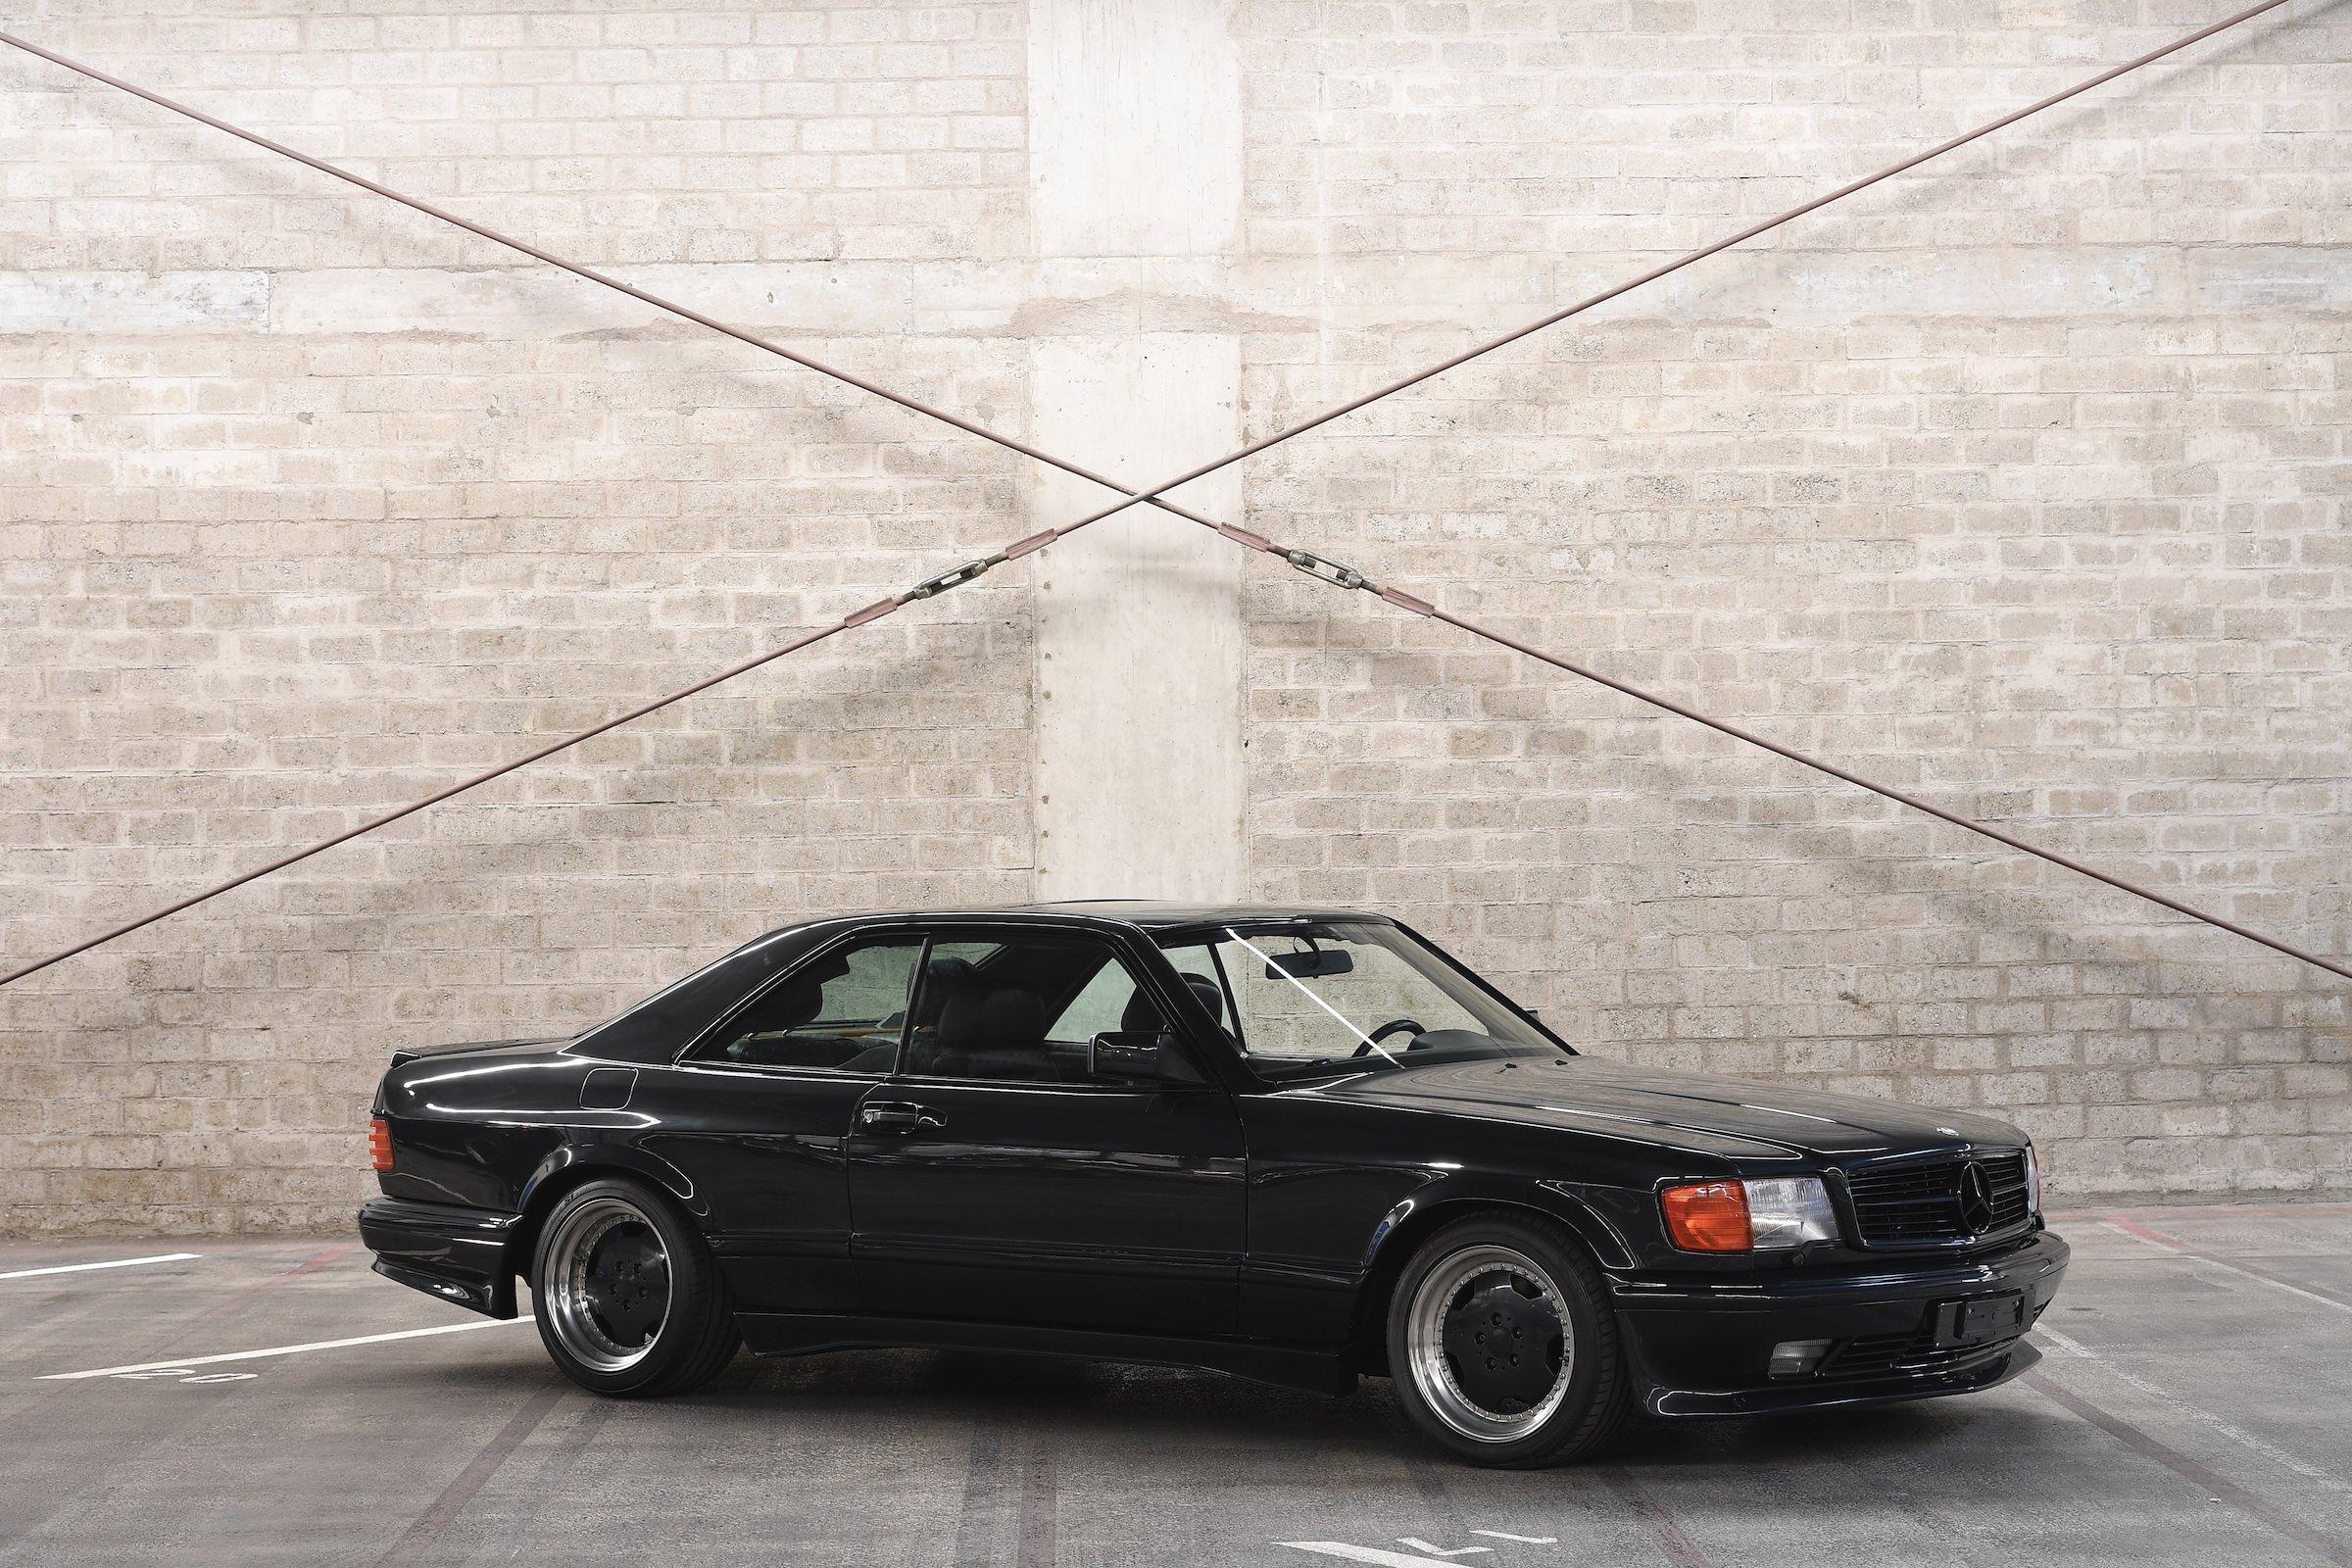 mercedes benz 560 sec amg 6 0 wide body 385 hp german gt. Black Bedroom Furniture Sets. Home Design Ideas